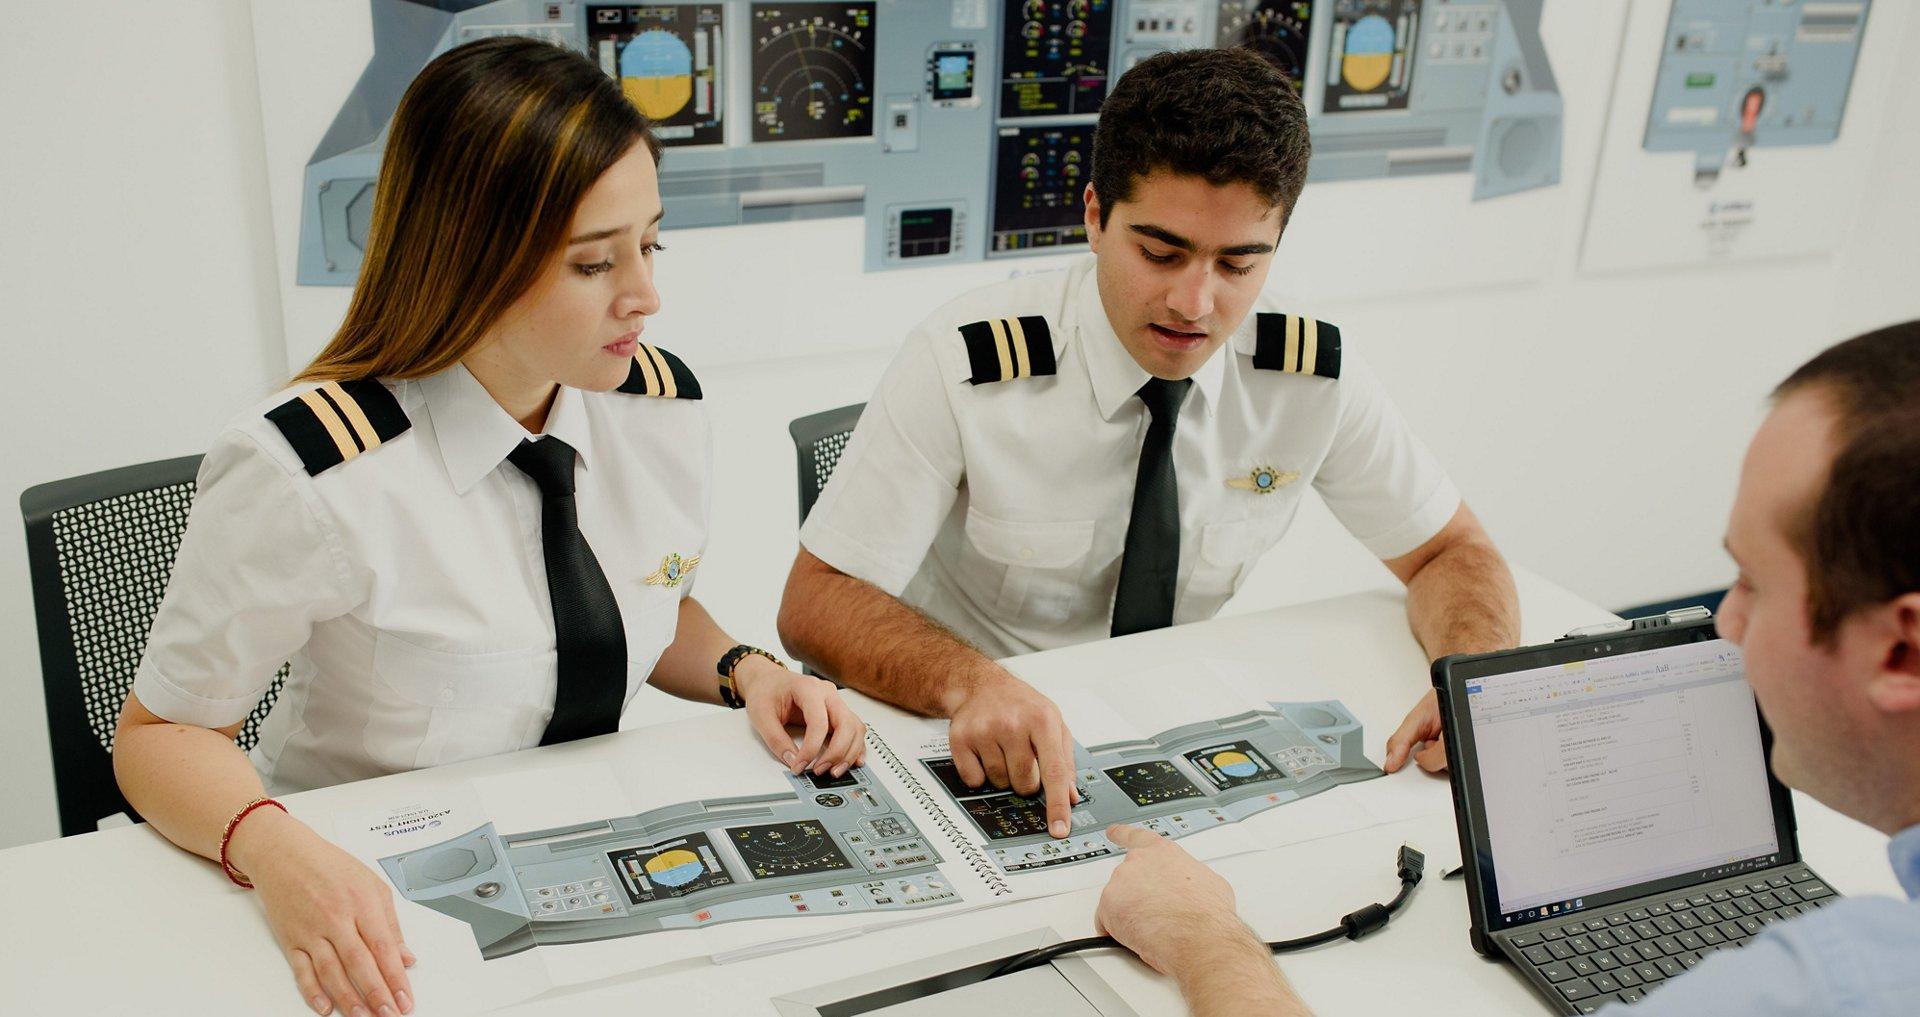 Pilot Cadet Training Programme